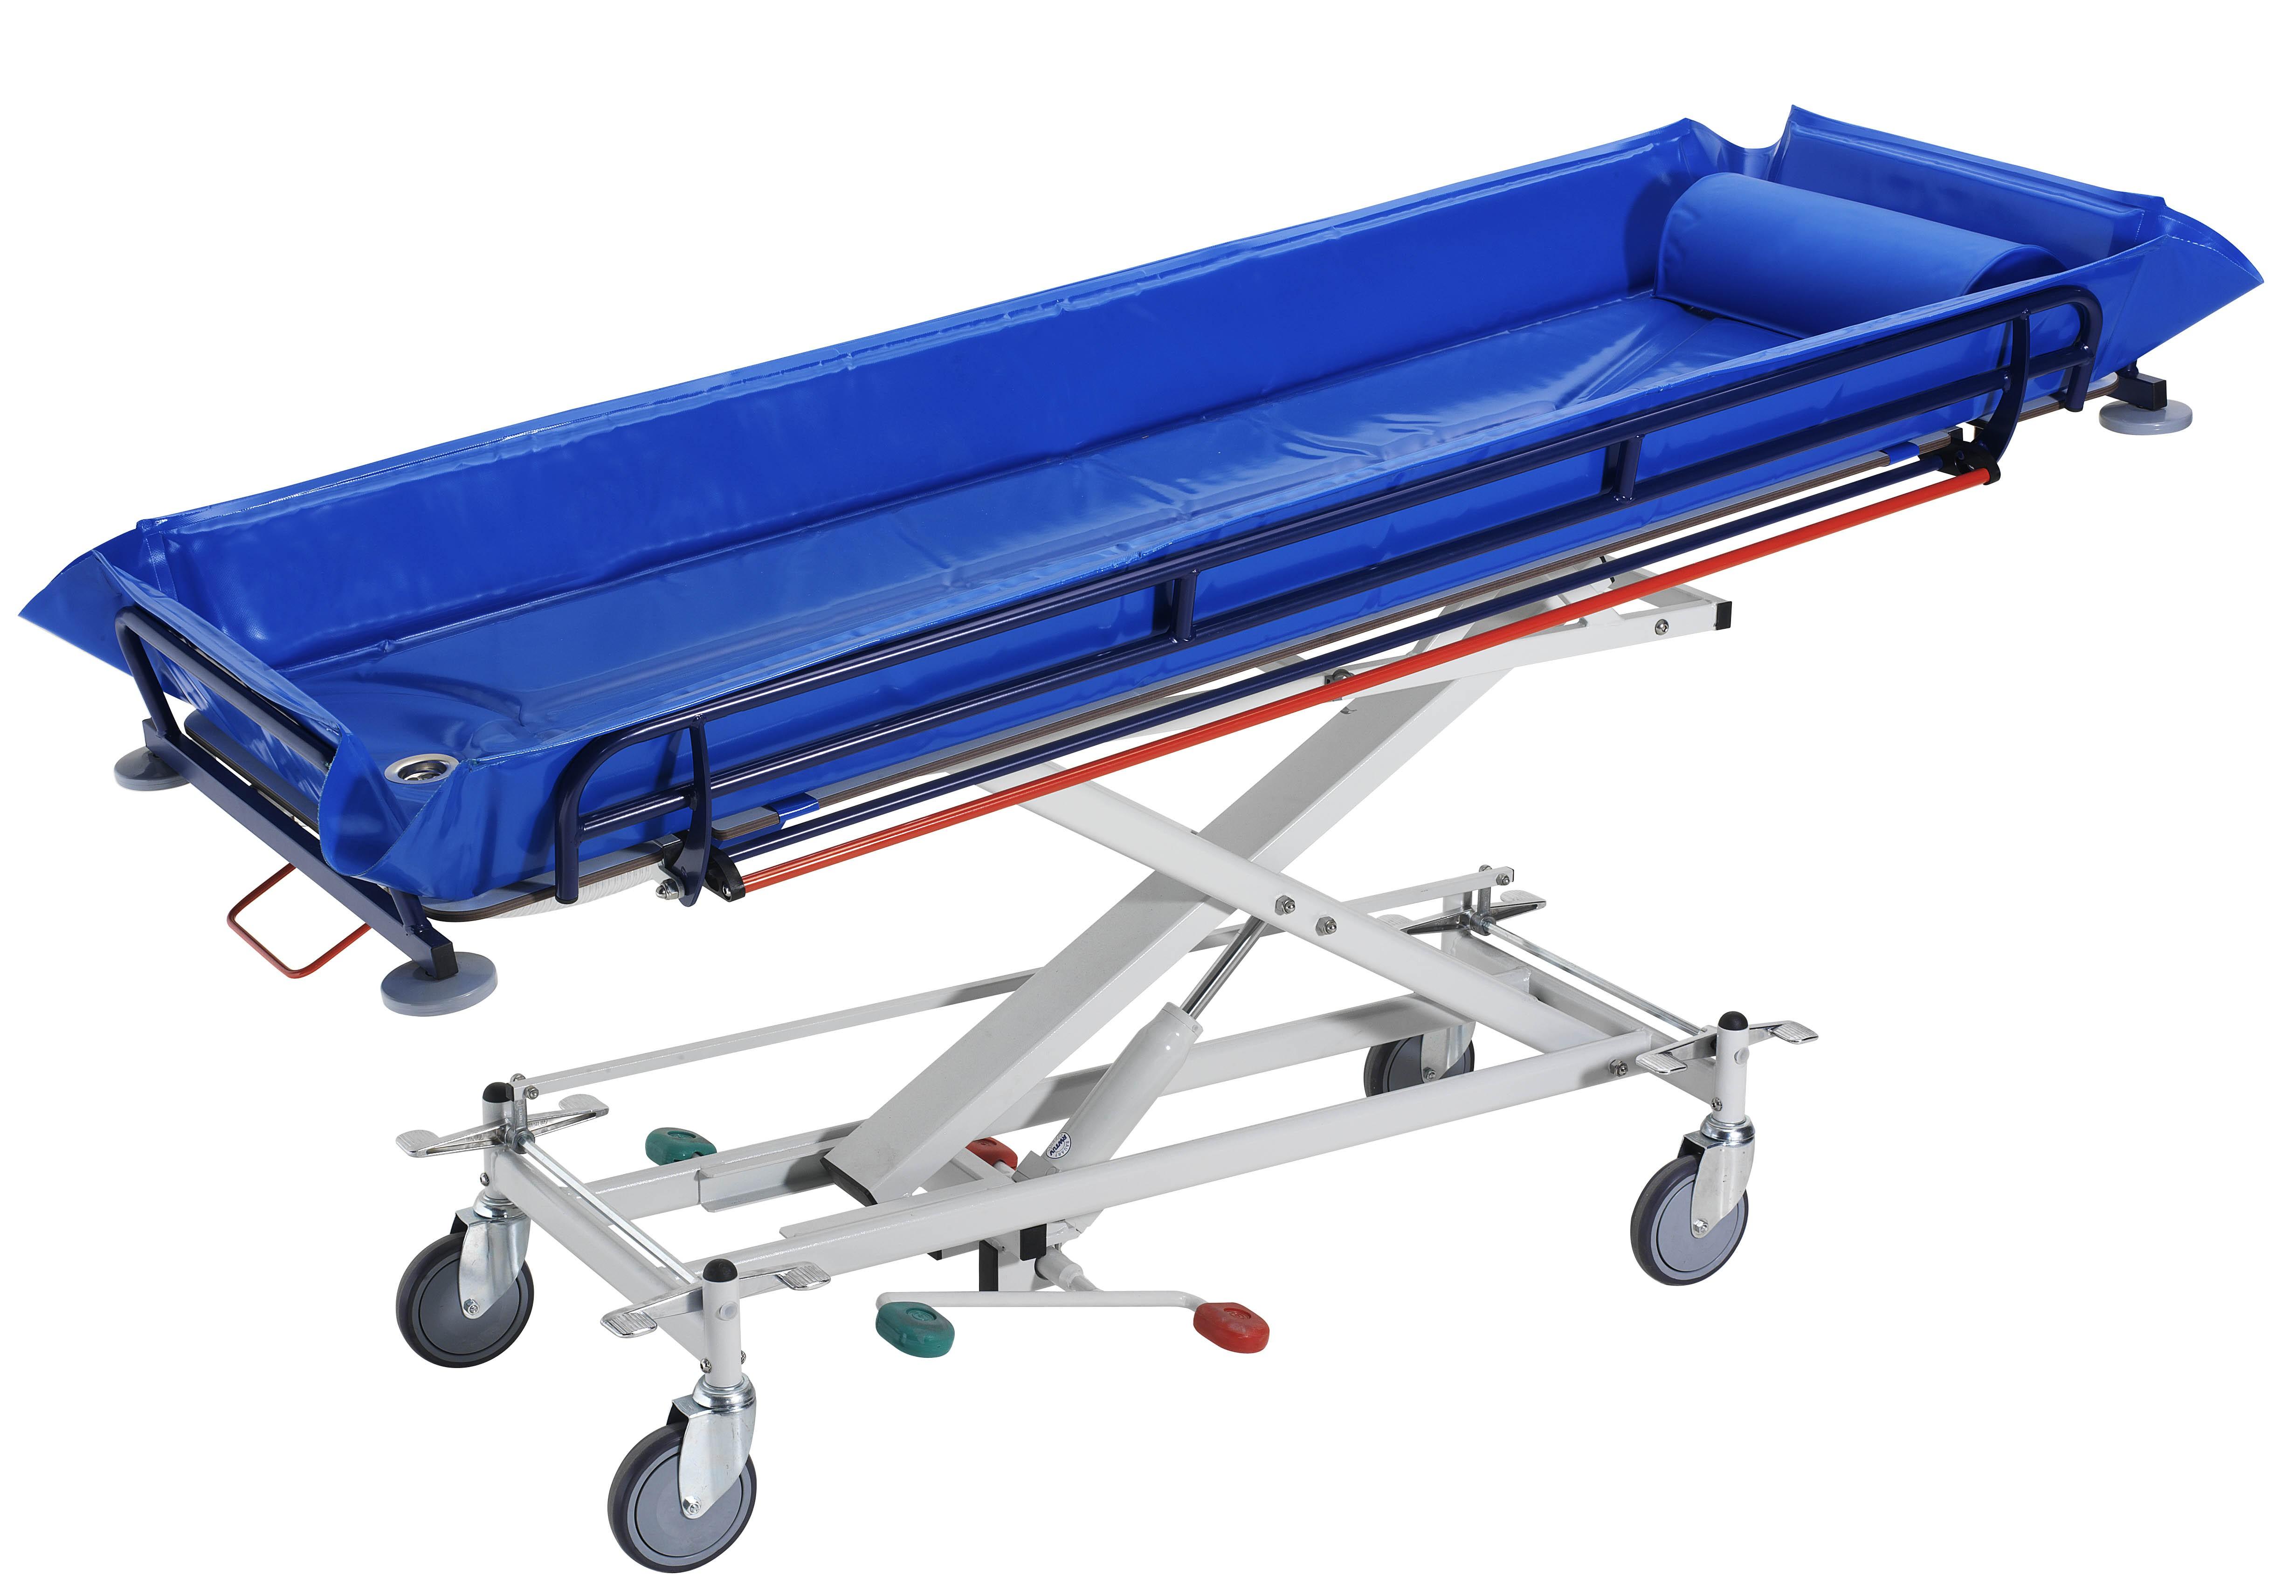 shower pin airline airplane really am trolleys trolley bordbar pan cool